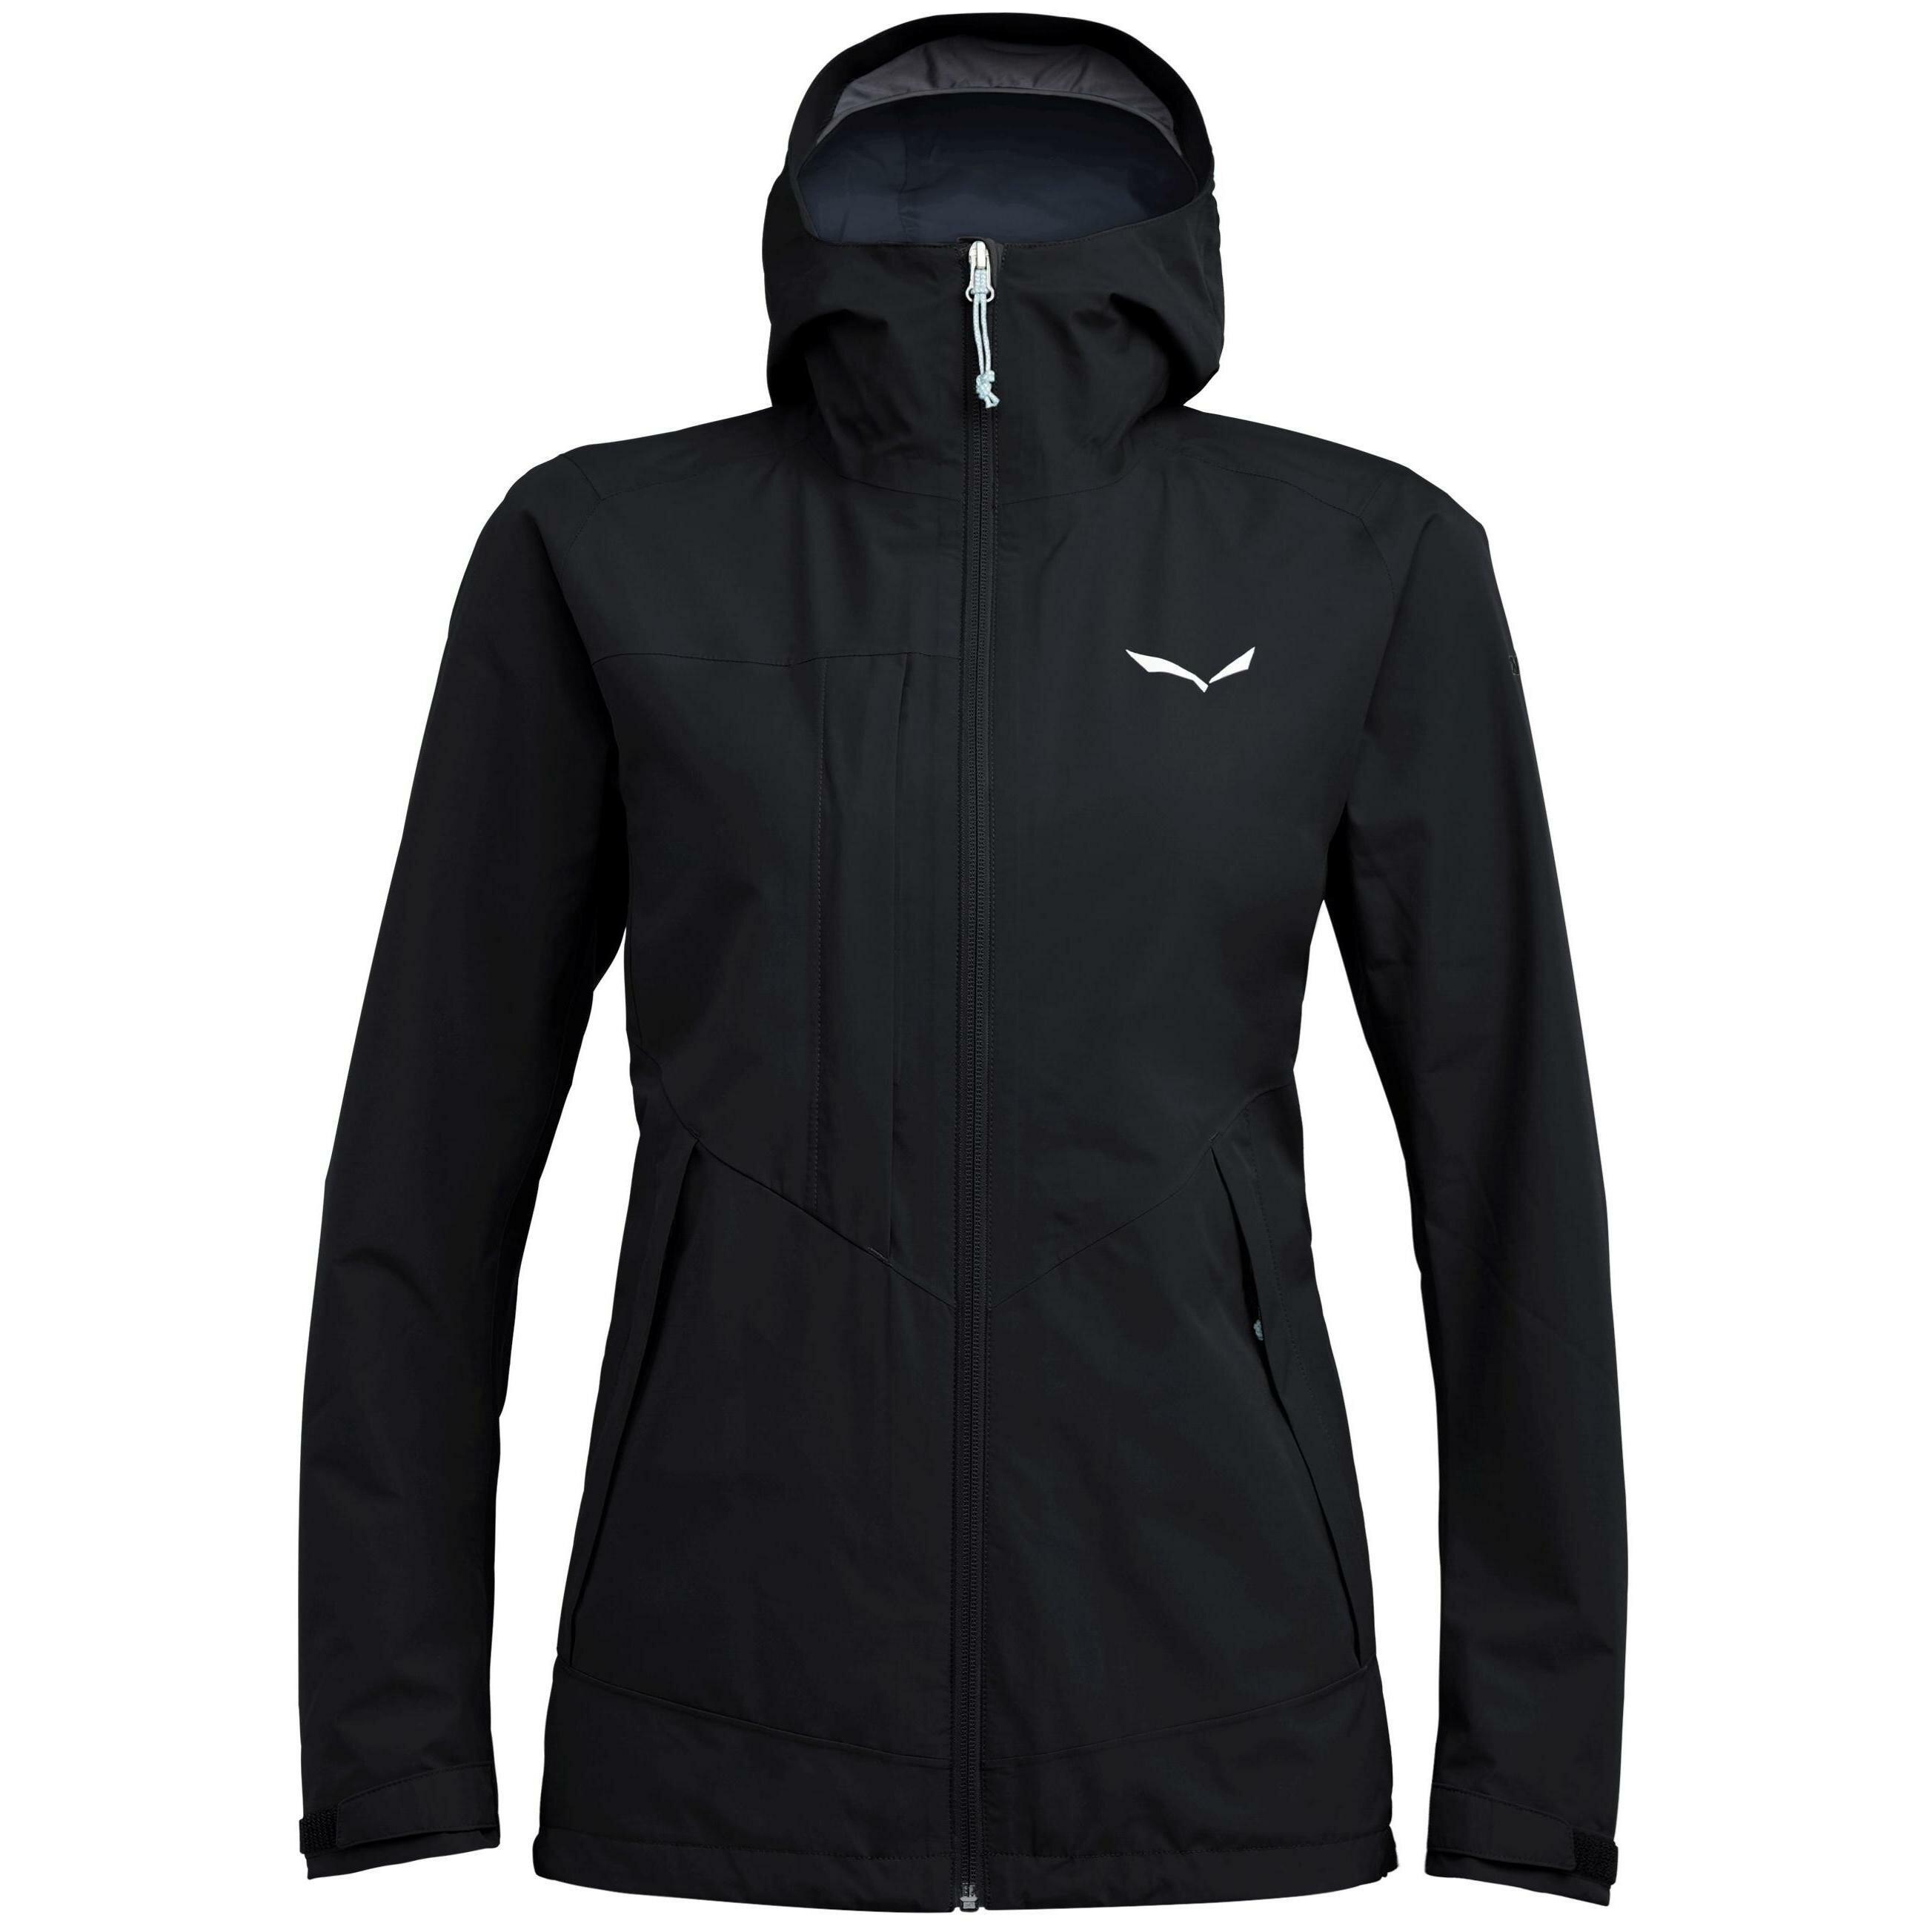 Куртка Для Активного Отдыха Salewa 2019 Puez 2 Gtx 2L W Jkt Black Out (Eur:42/36)